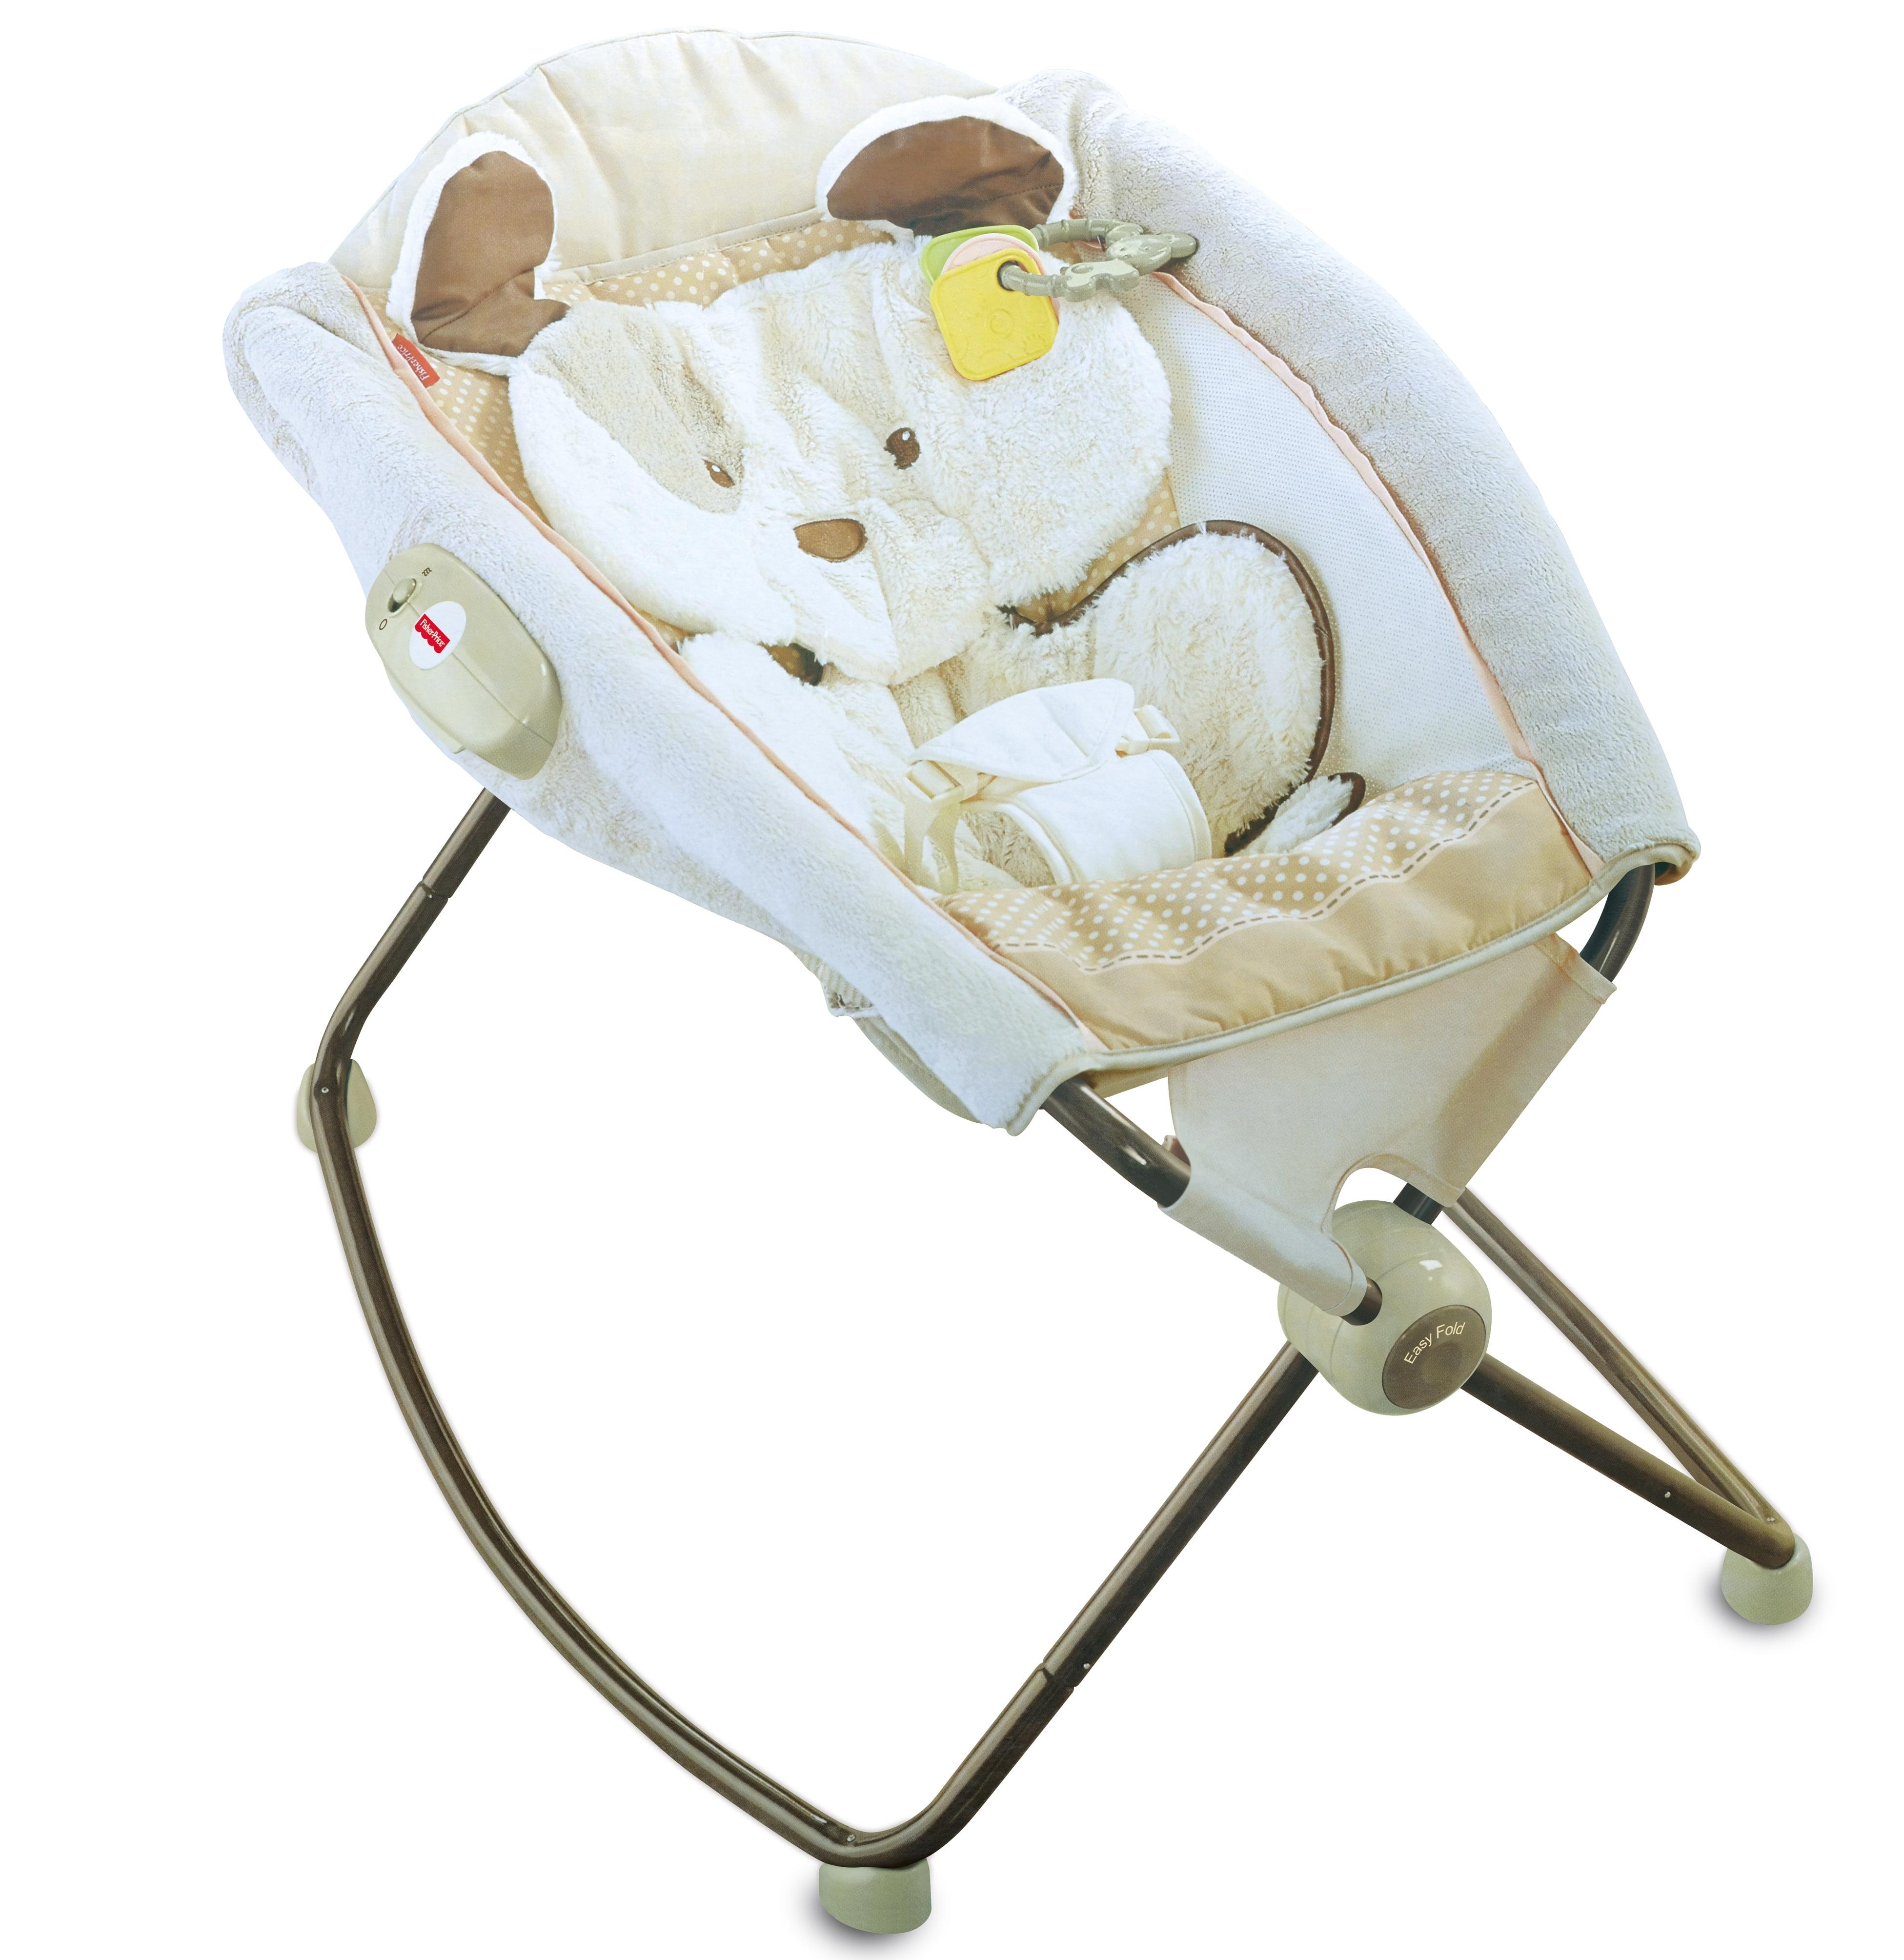 Super soft Infant rocking chair baby vibration cradle recliner